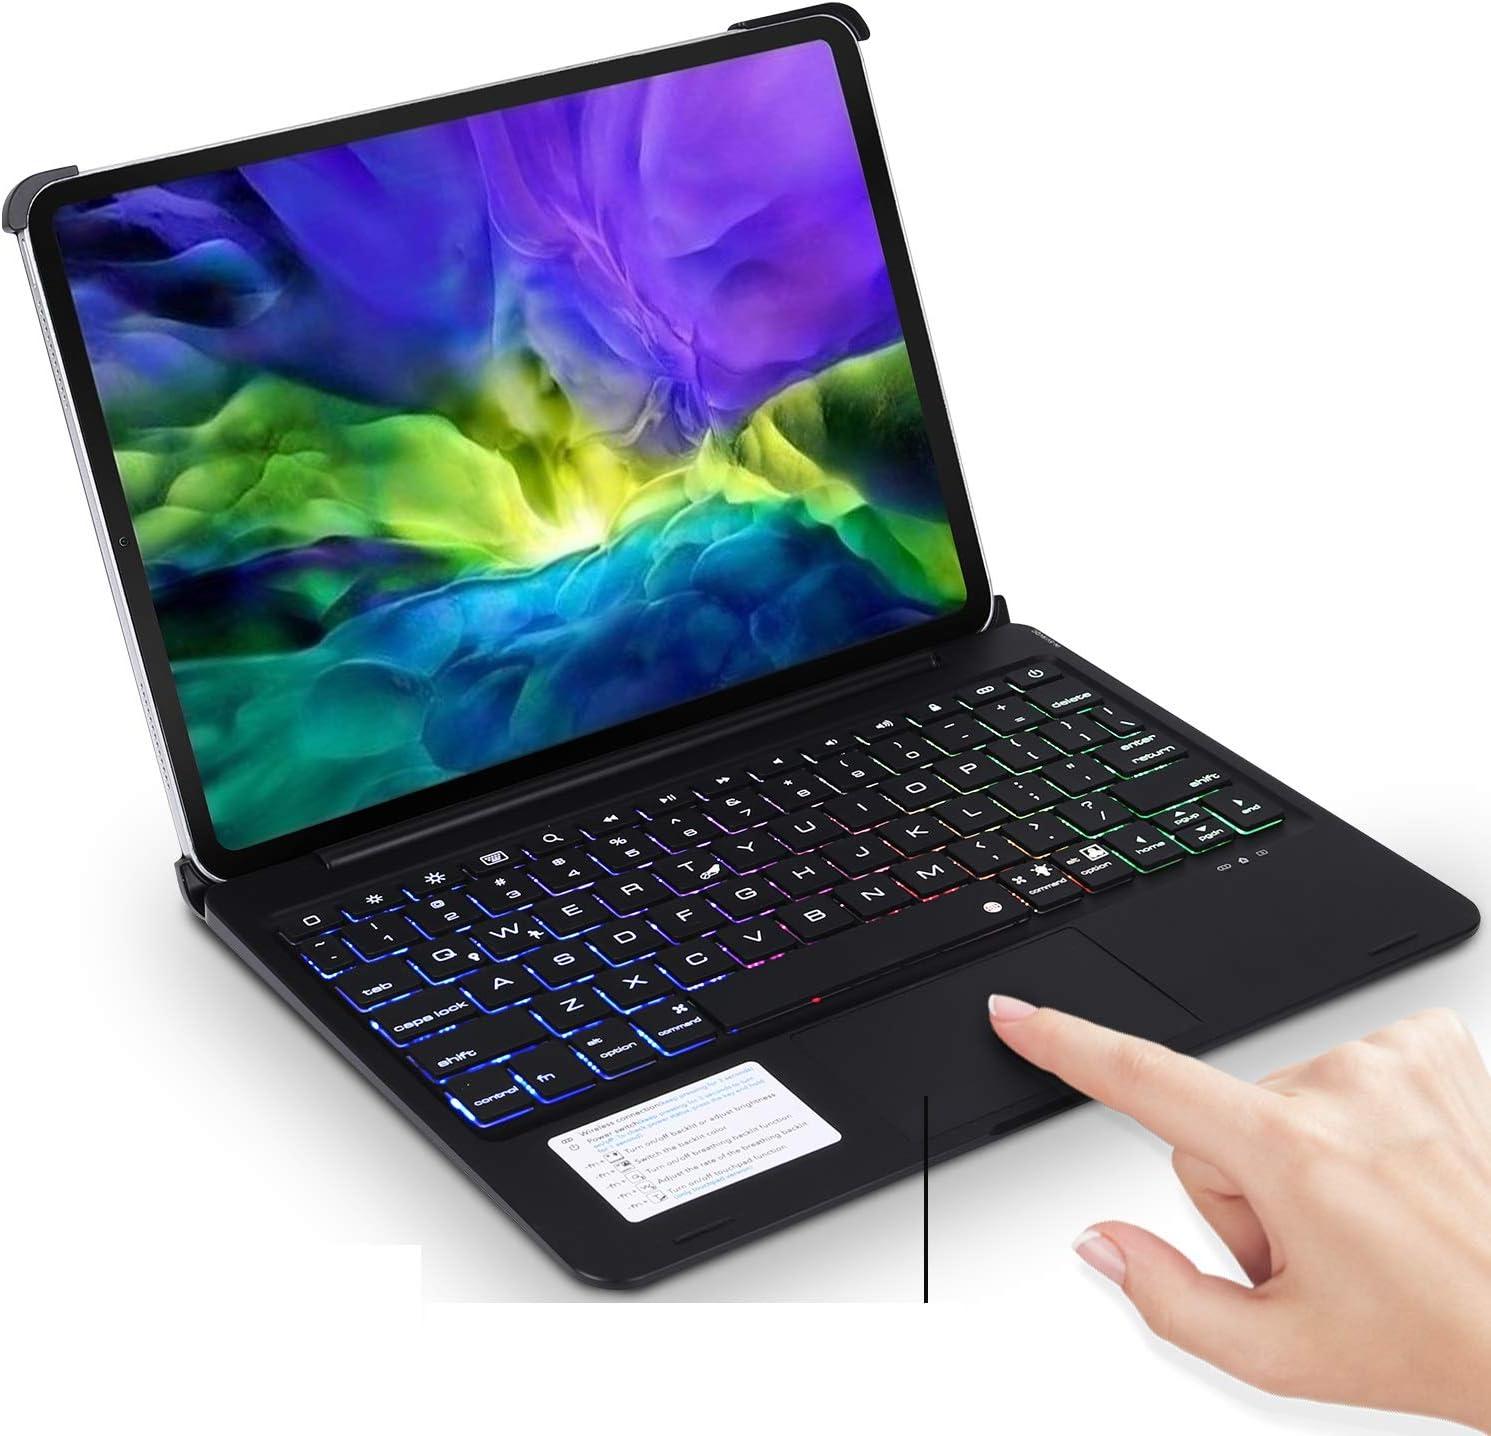 iPad Pro 11 Case 2020 with Keyboard & Touchpad,ONHI Backlits Bluetooth Flip Smart Keyboard Case for iPad Pro 1st & 2nd Gen 11